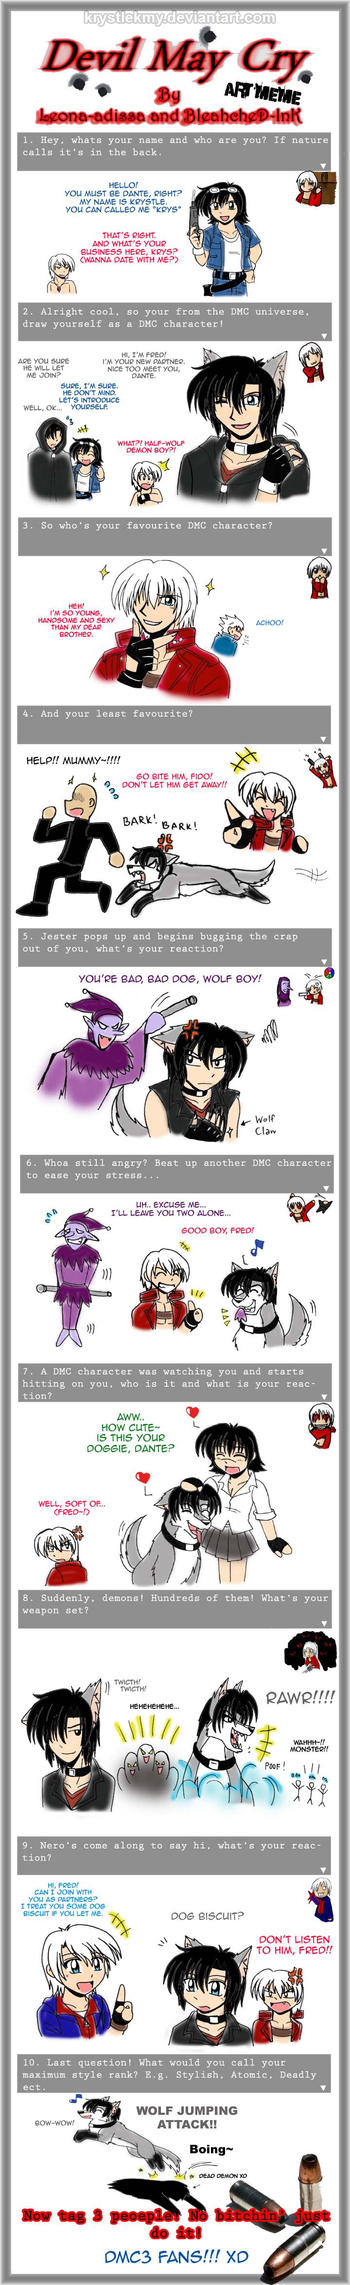 Devil May Cry Art Meme by krystlekmy